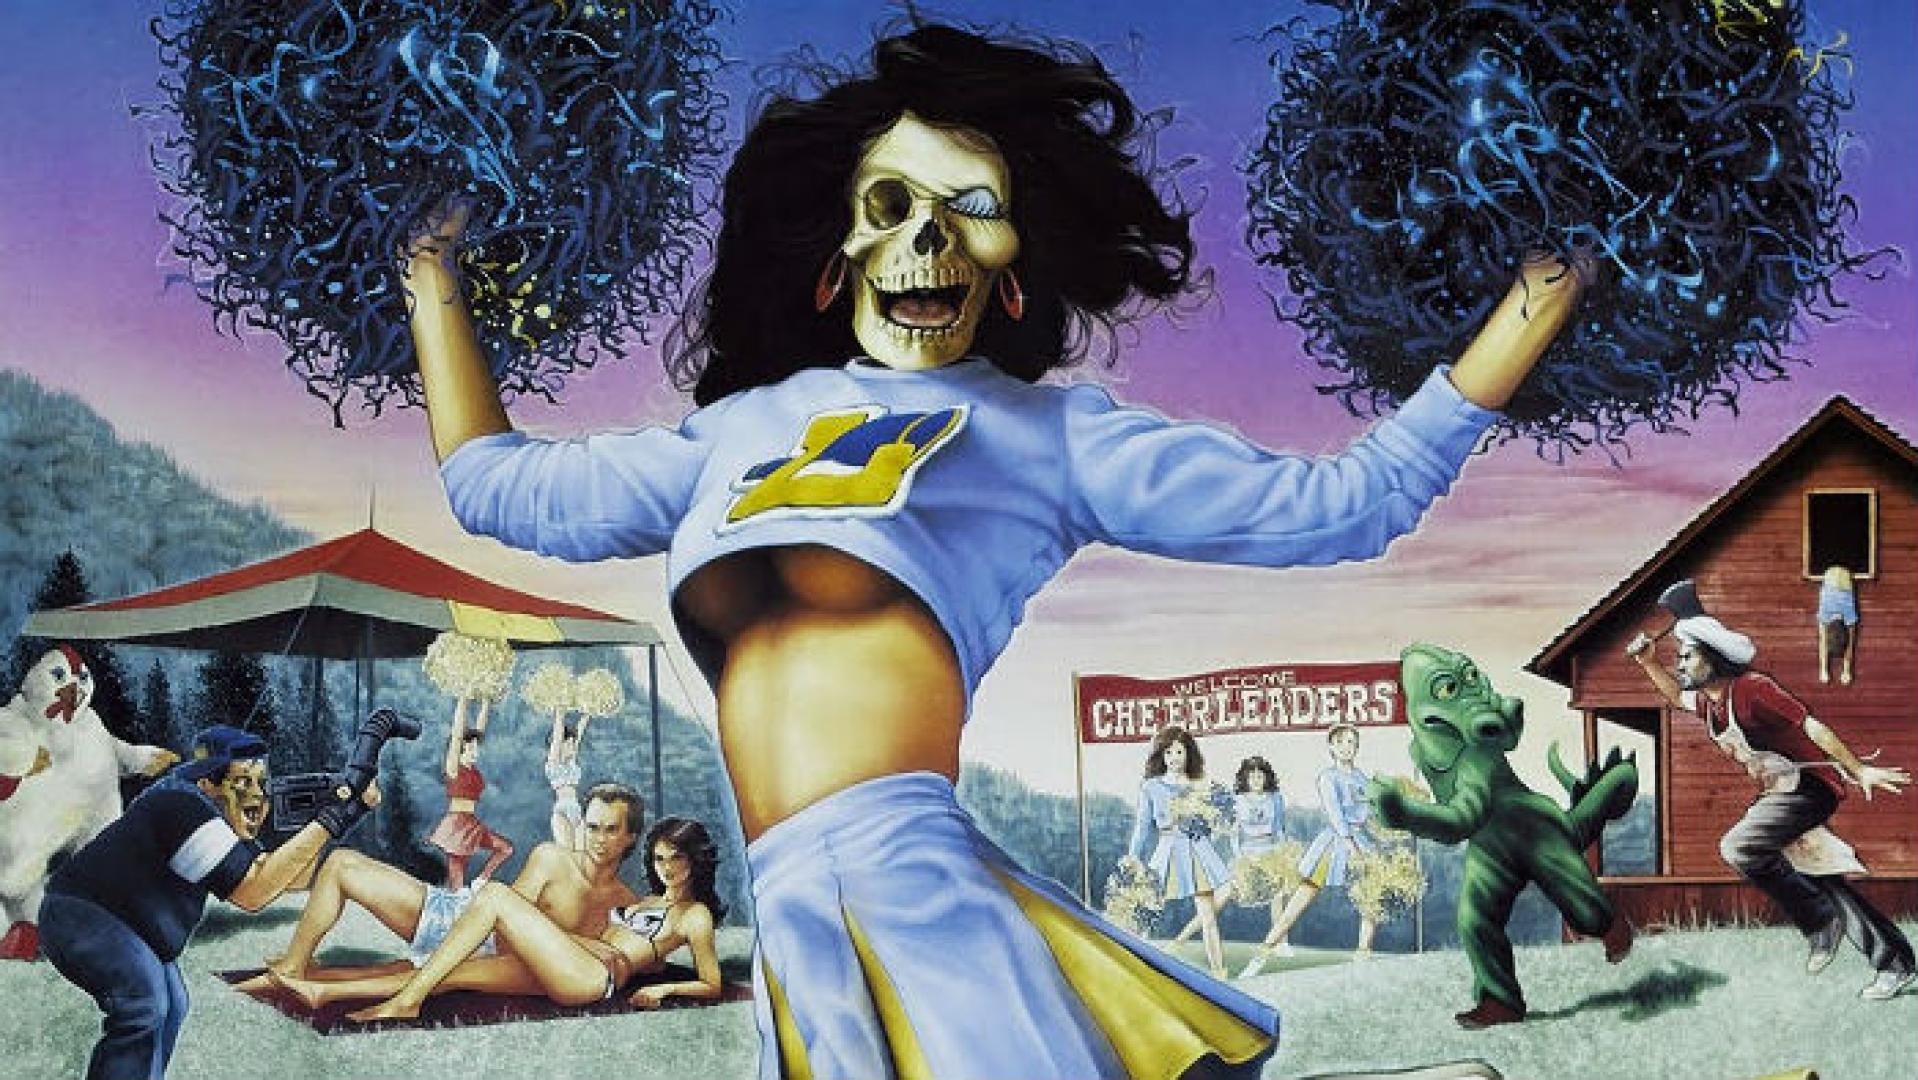 Cheerleader Camp (1988)